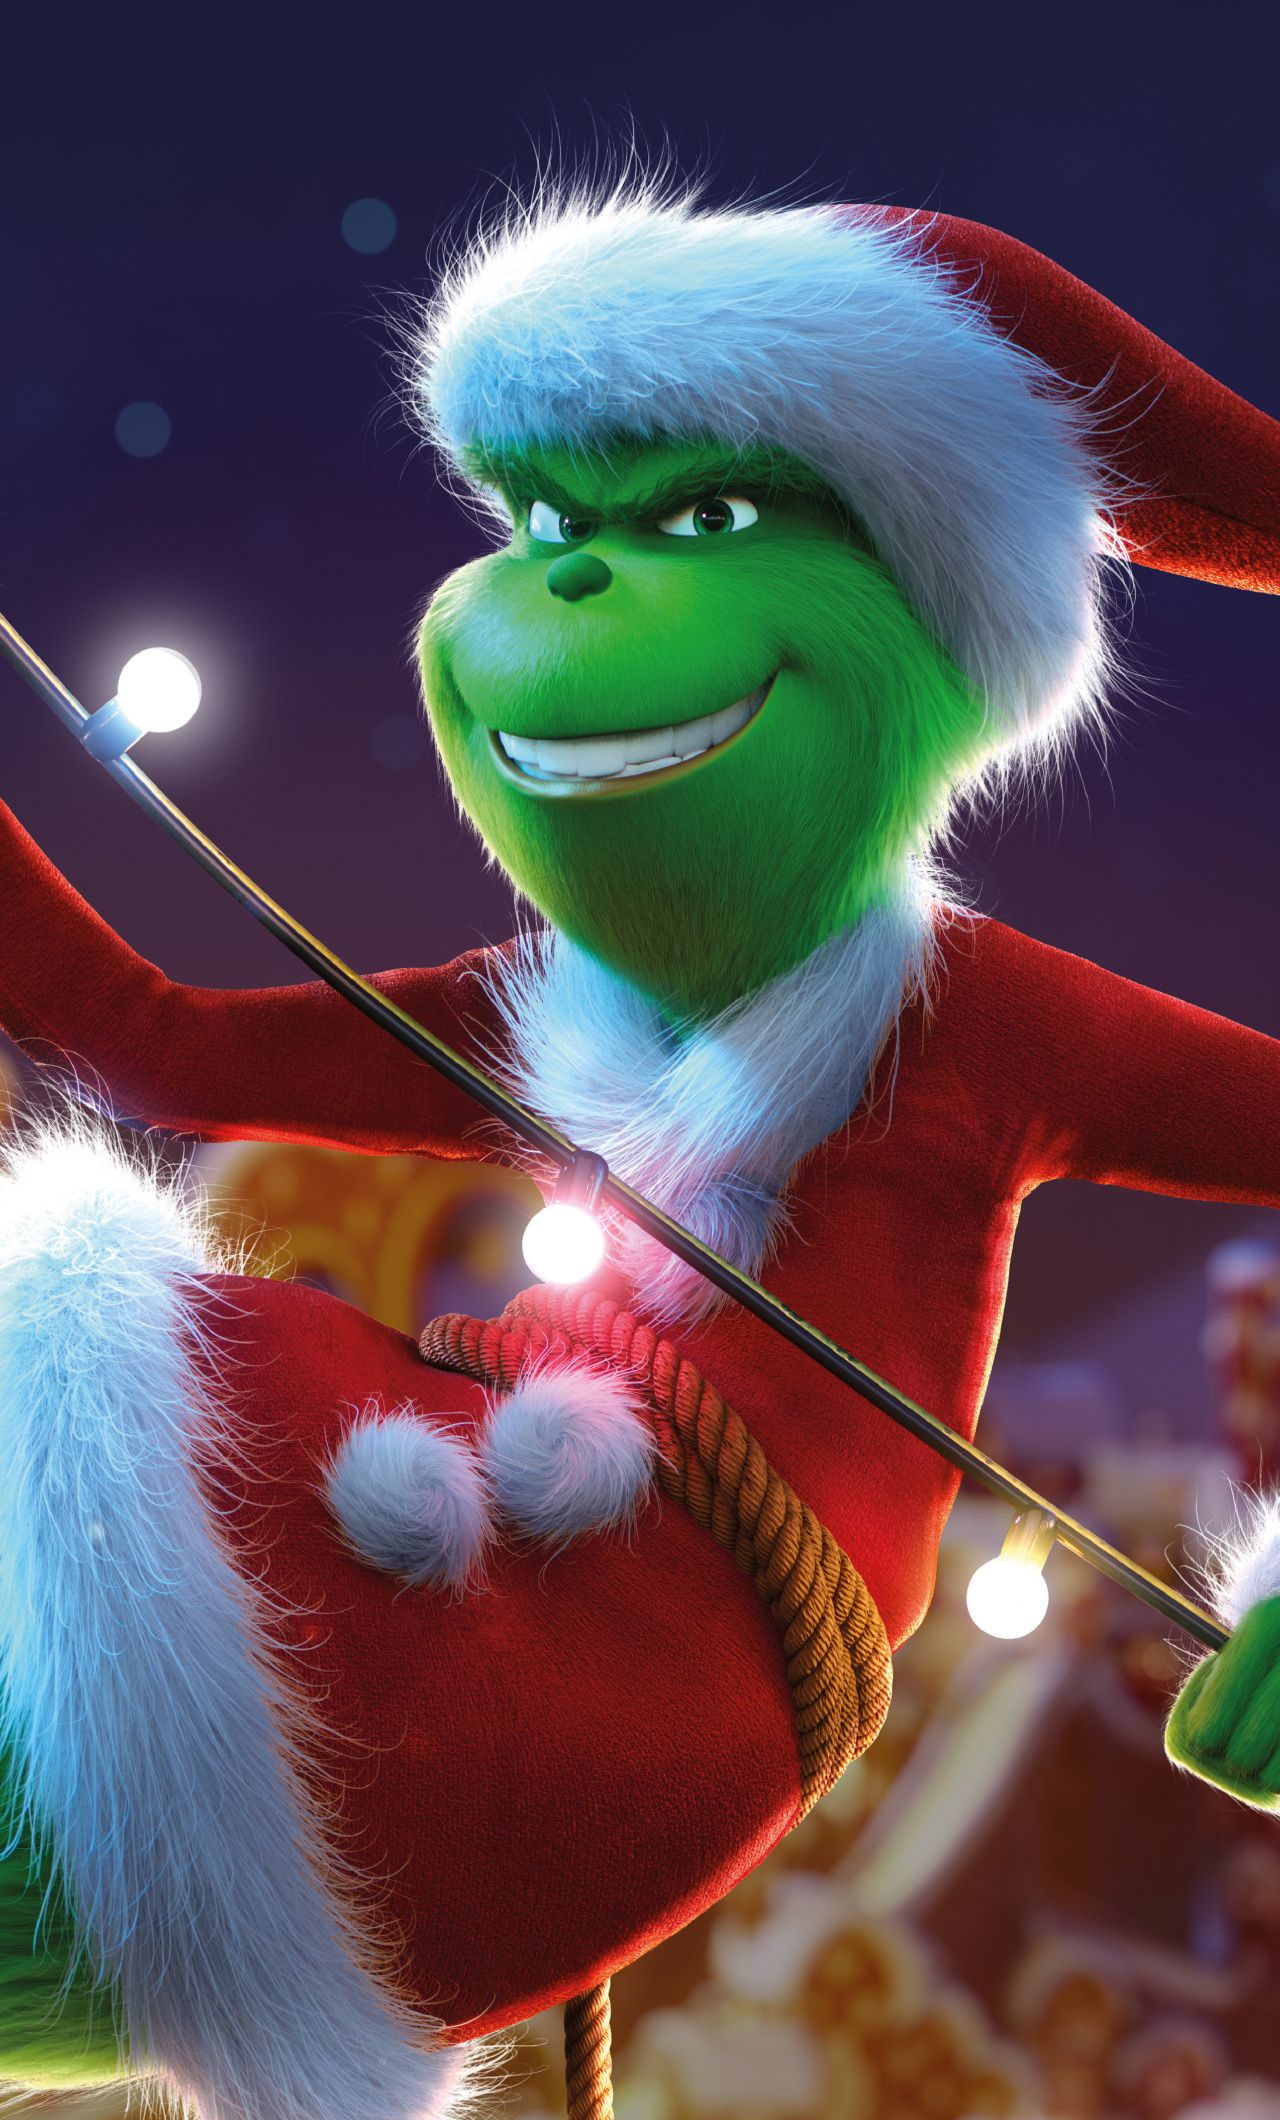 The Grinch, movie, Christmas, Animation movie, 2018